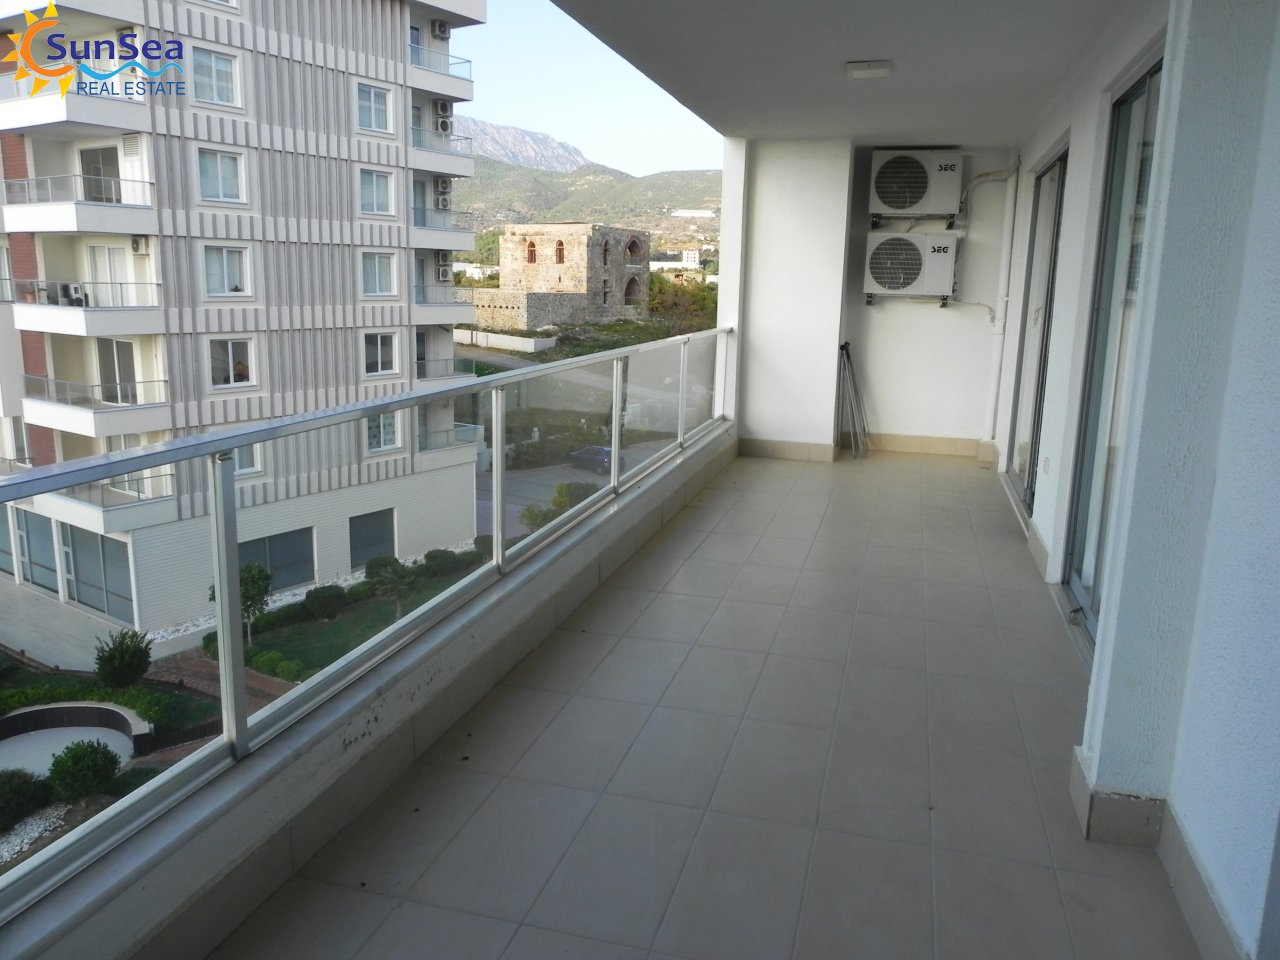 Alanya Fortuna Resort balcony